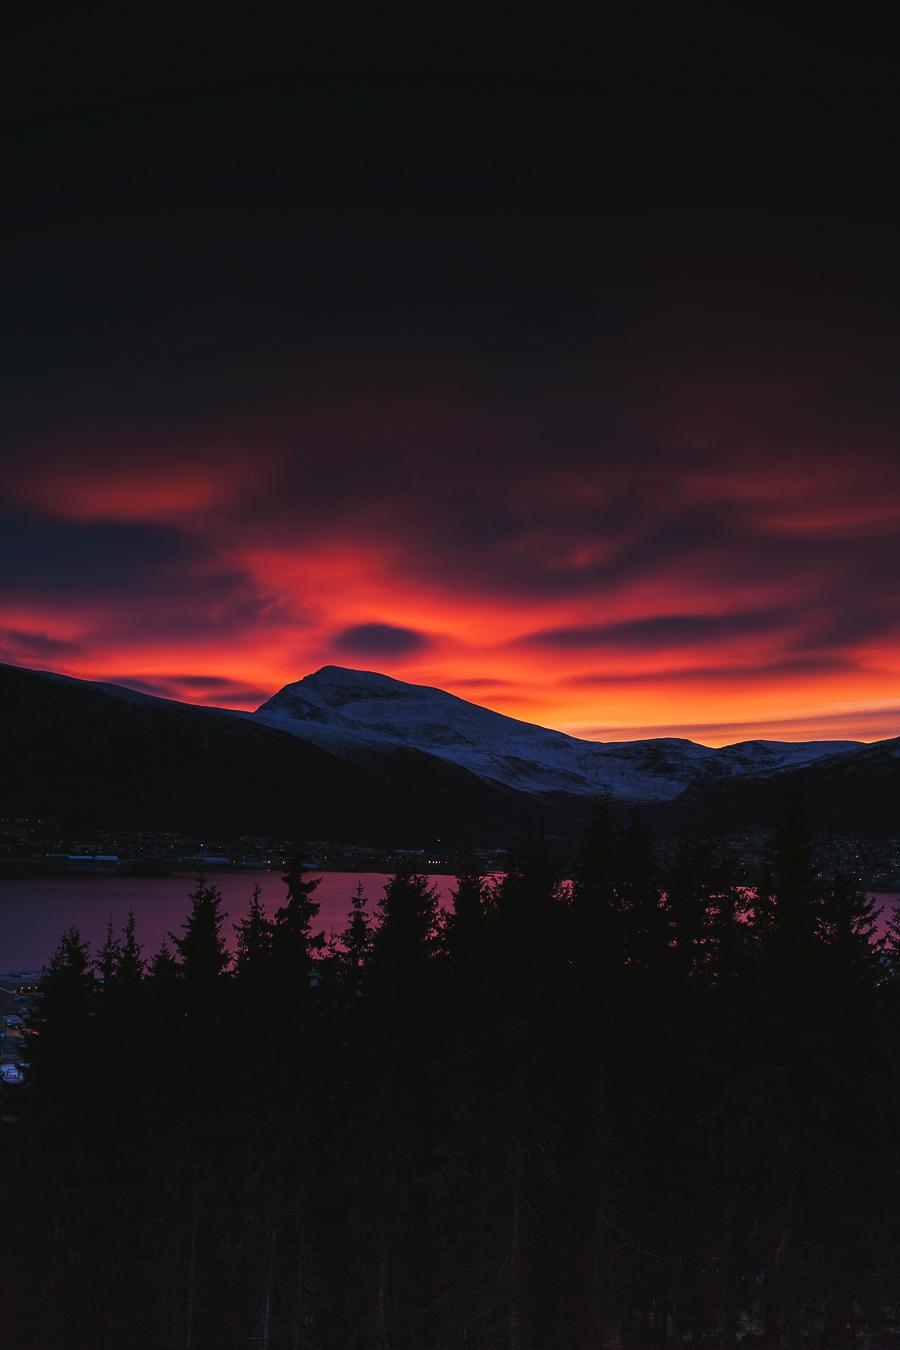 Flaming red sky in Tromsø